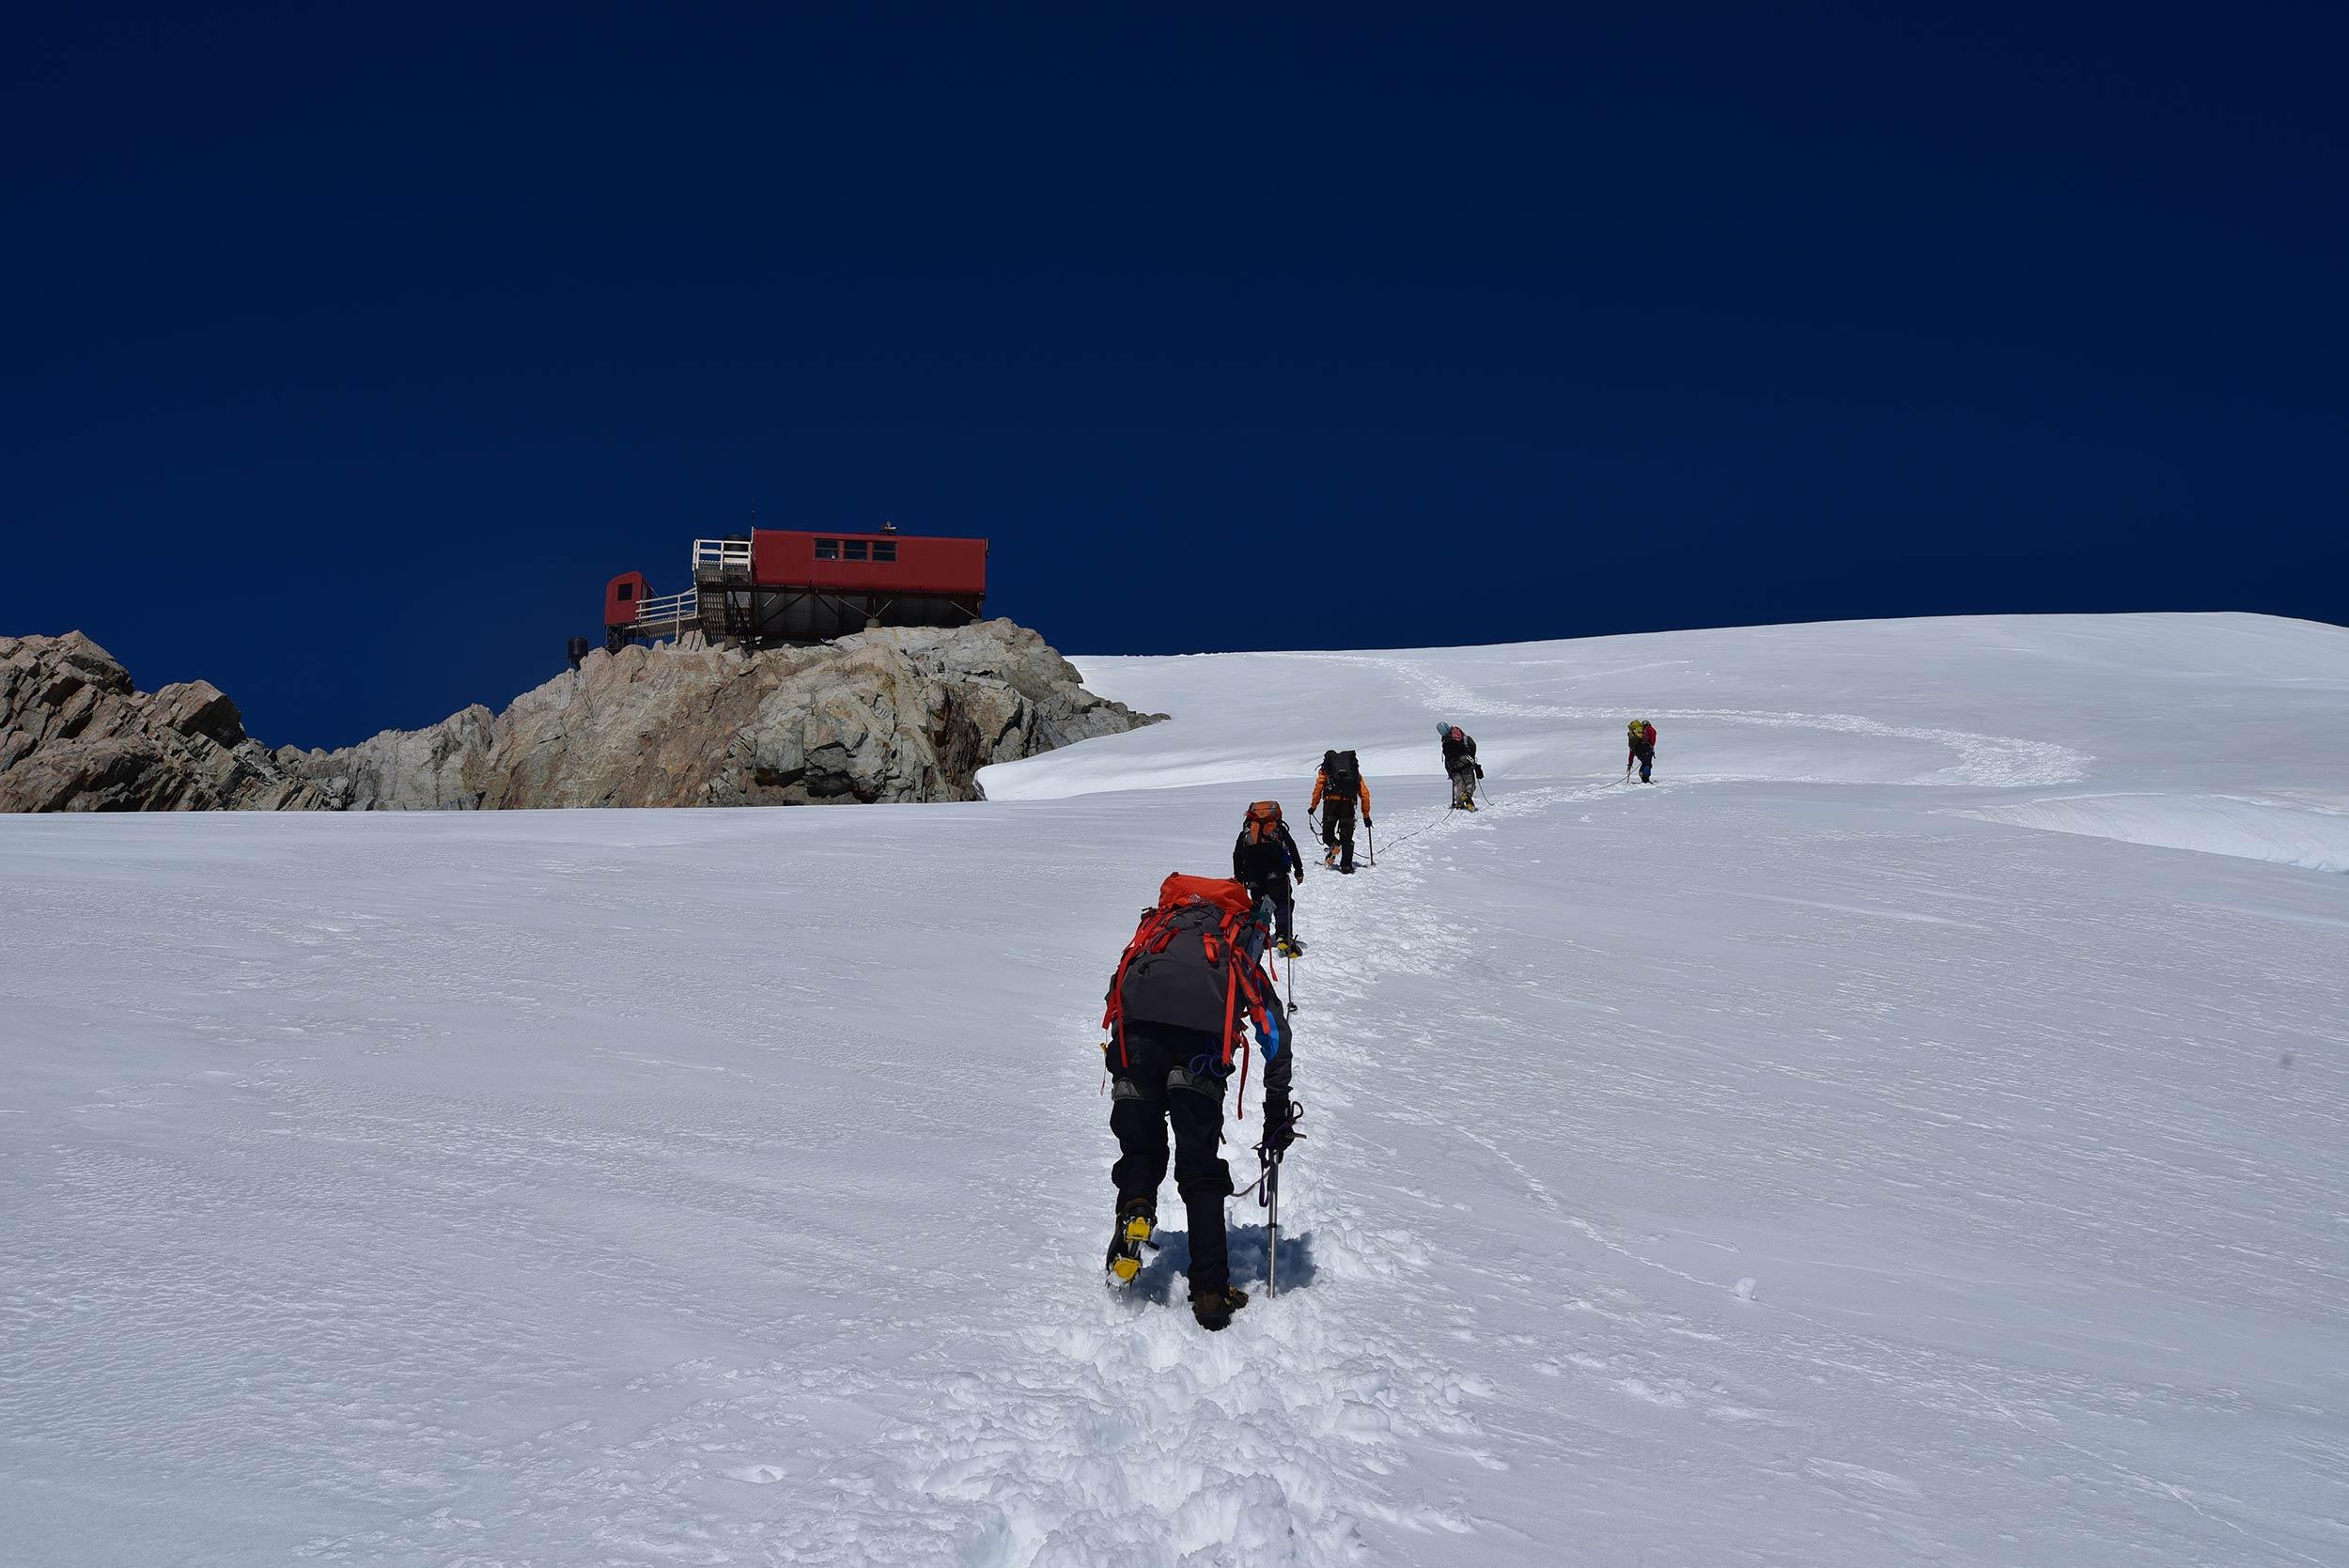 franz_josef_mountaineering_course_wanaka_guides.jpg